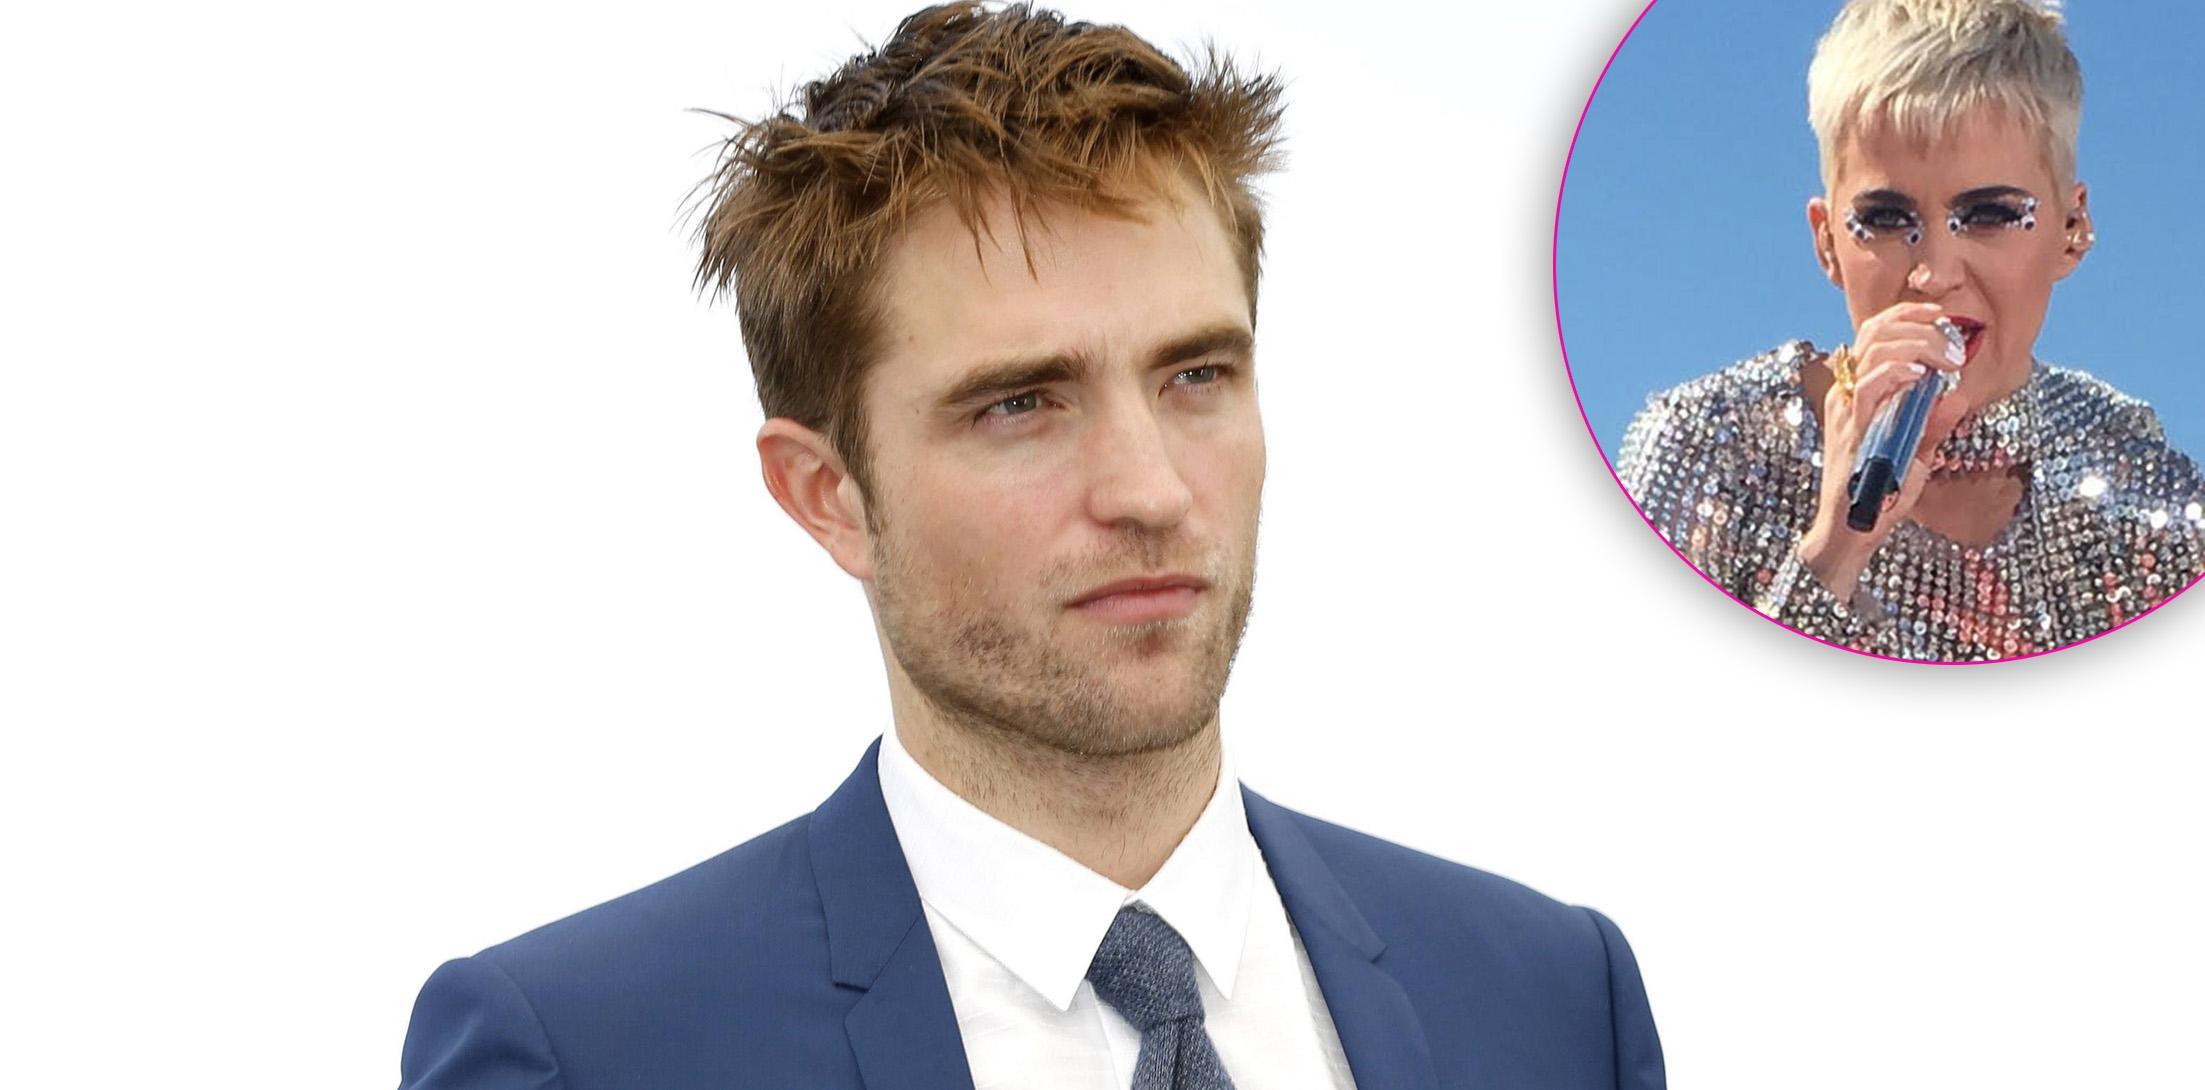 Robert Pattinson katy perry dating